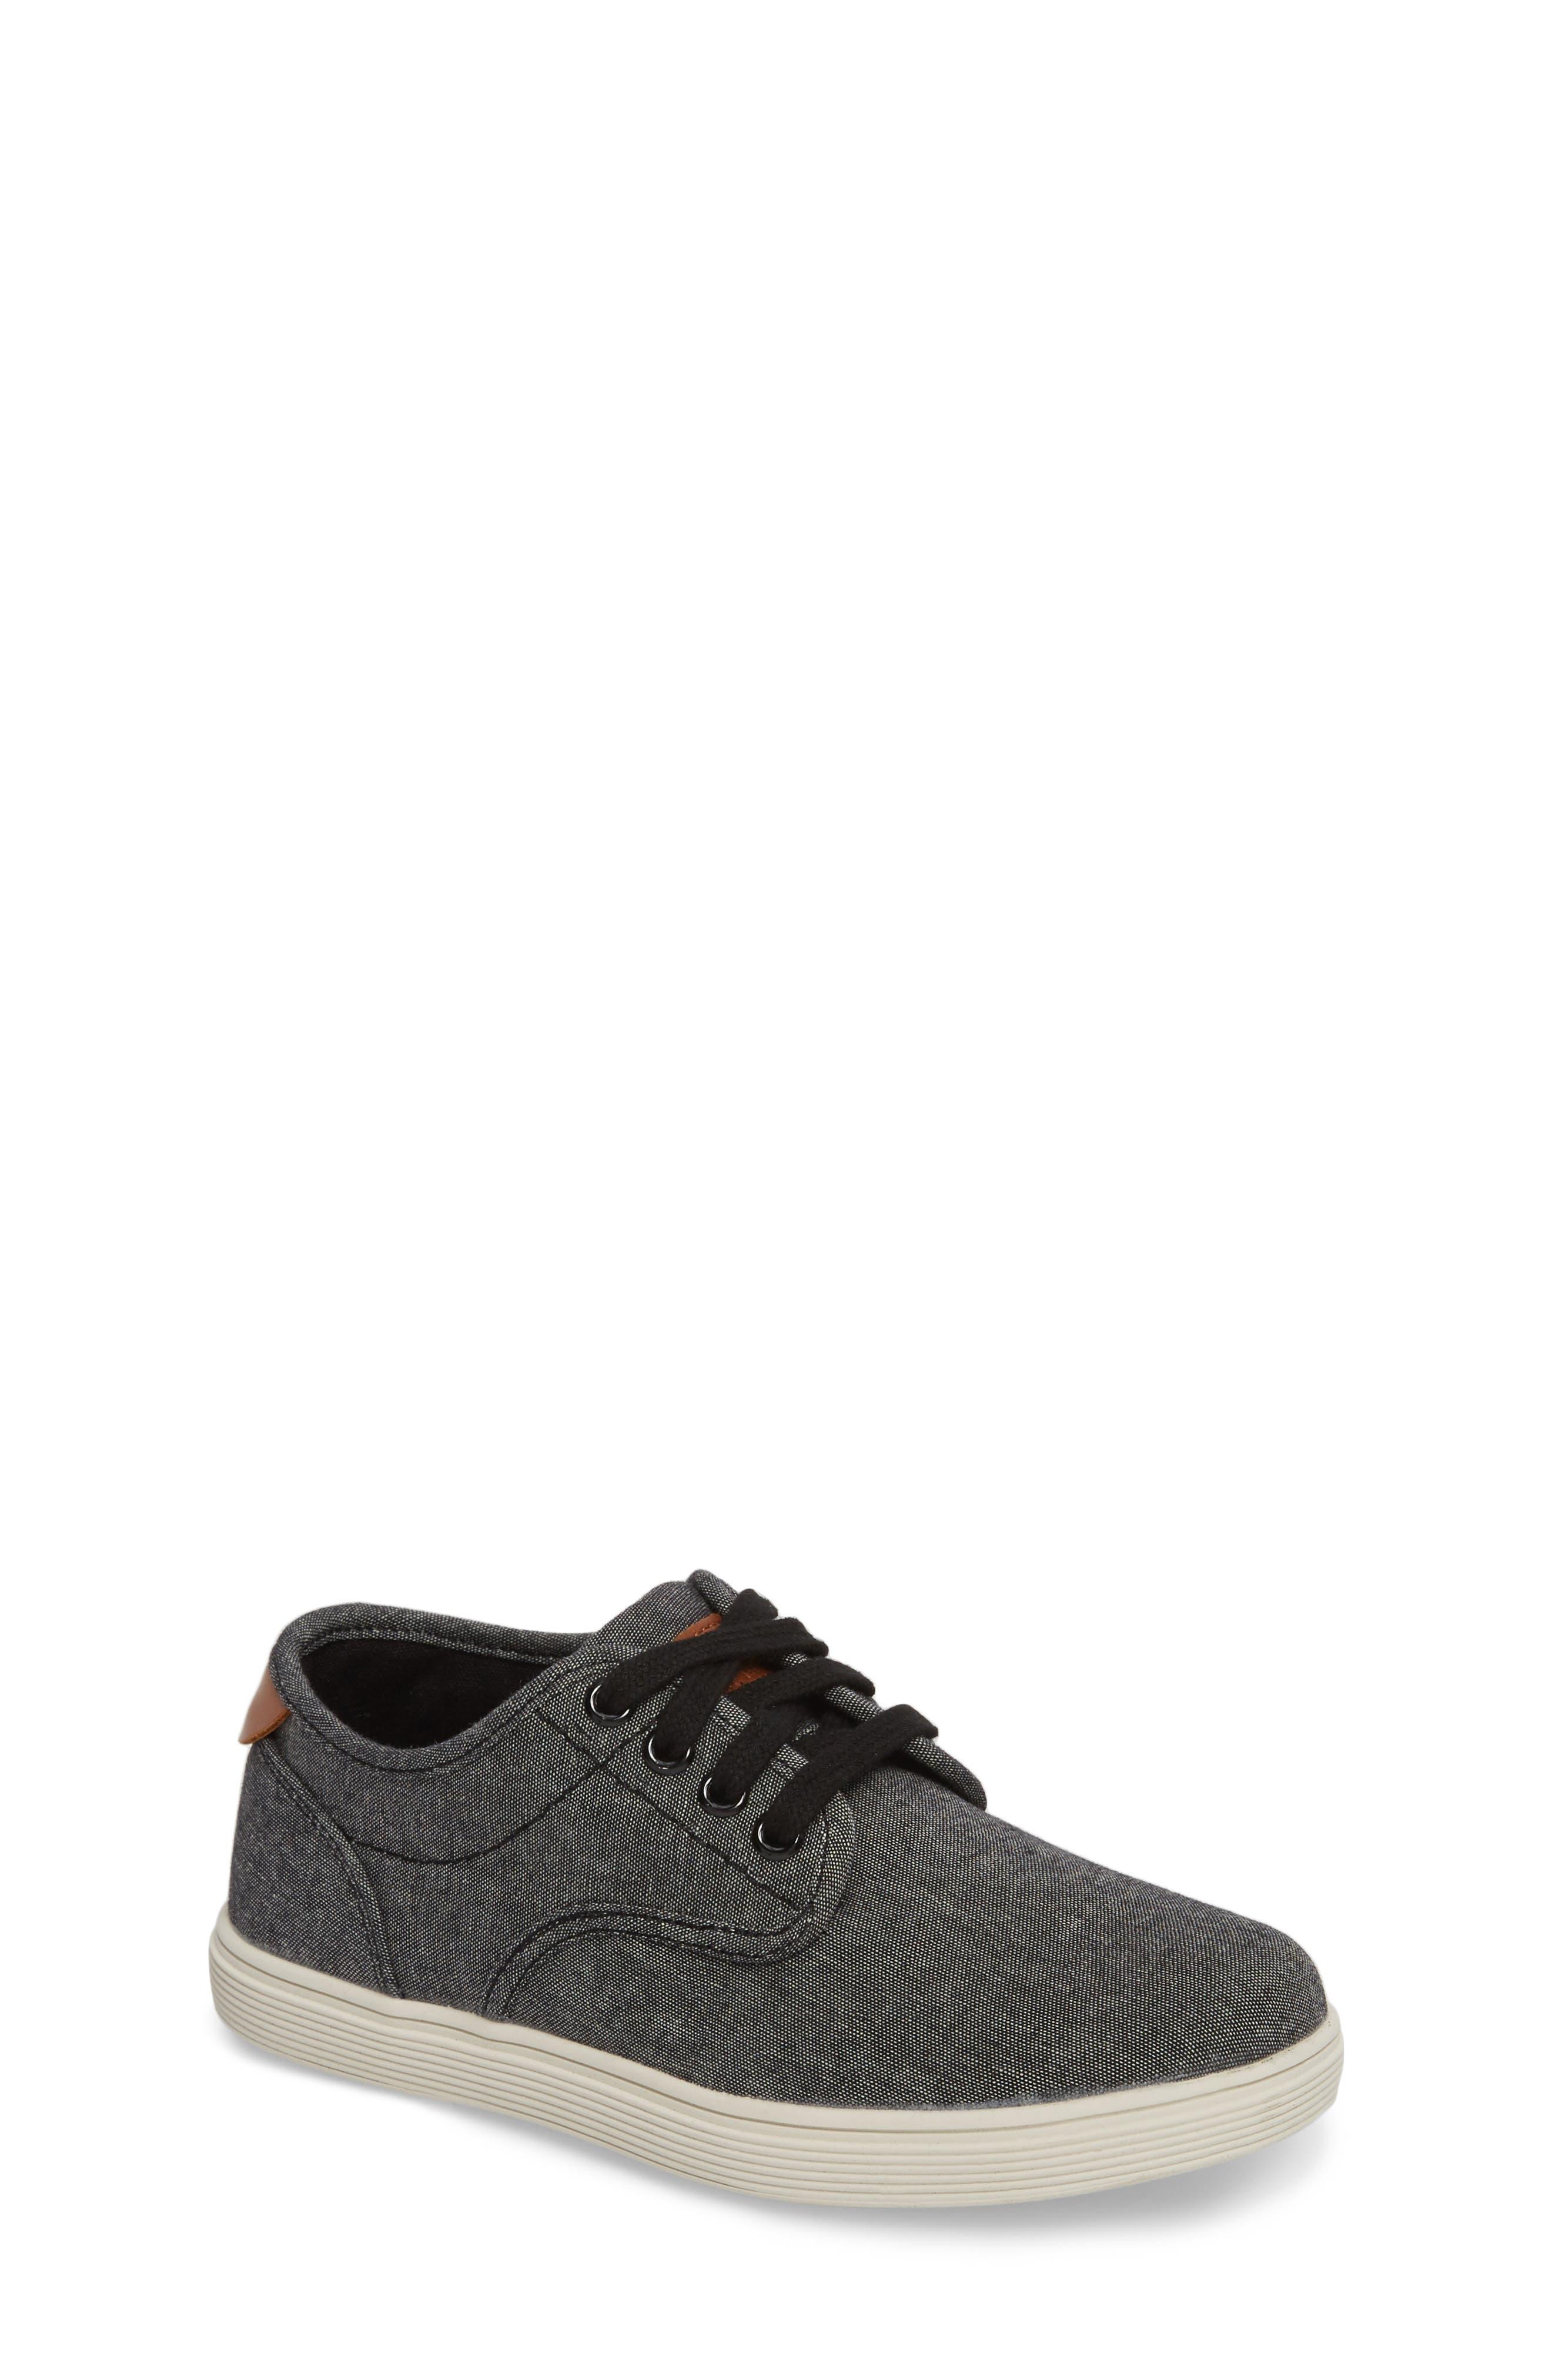 Bfenta Sneaker,                             Main thumbnail 1, color,